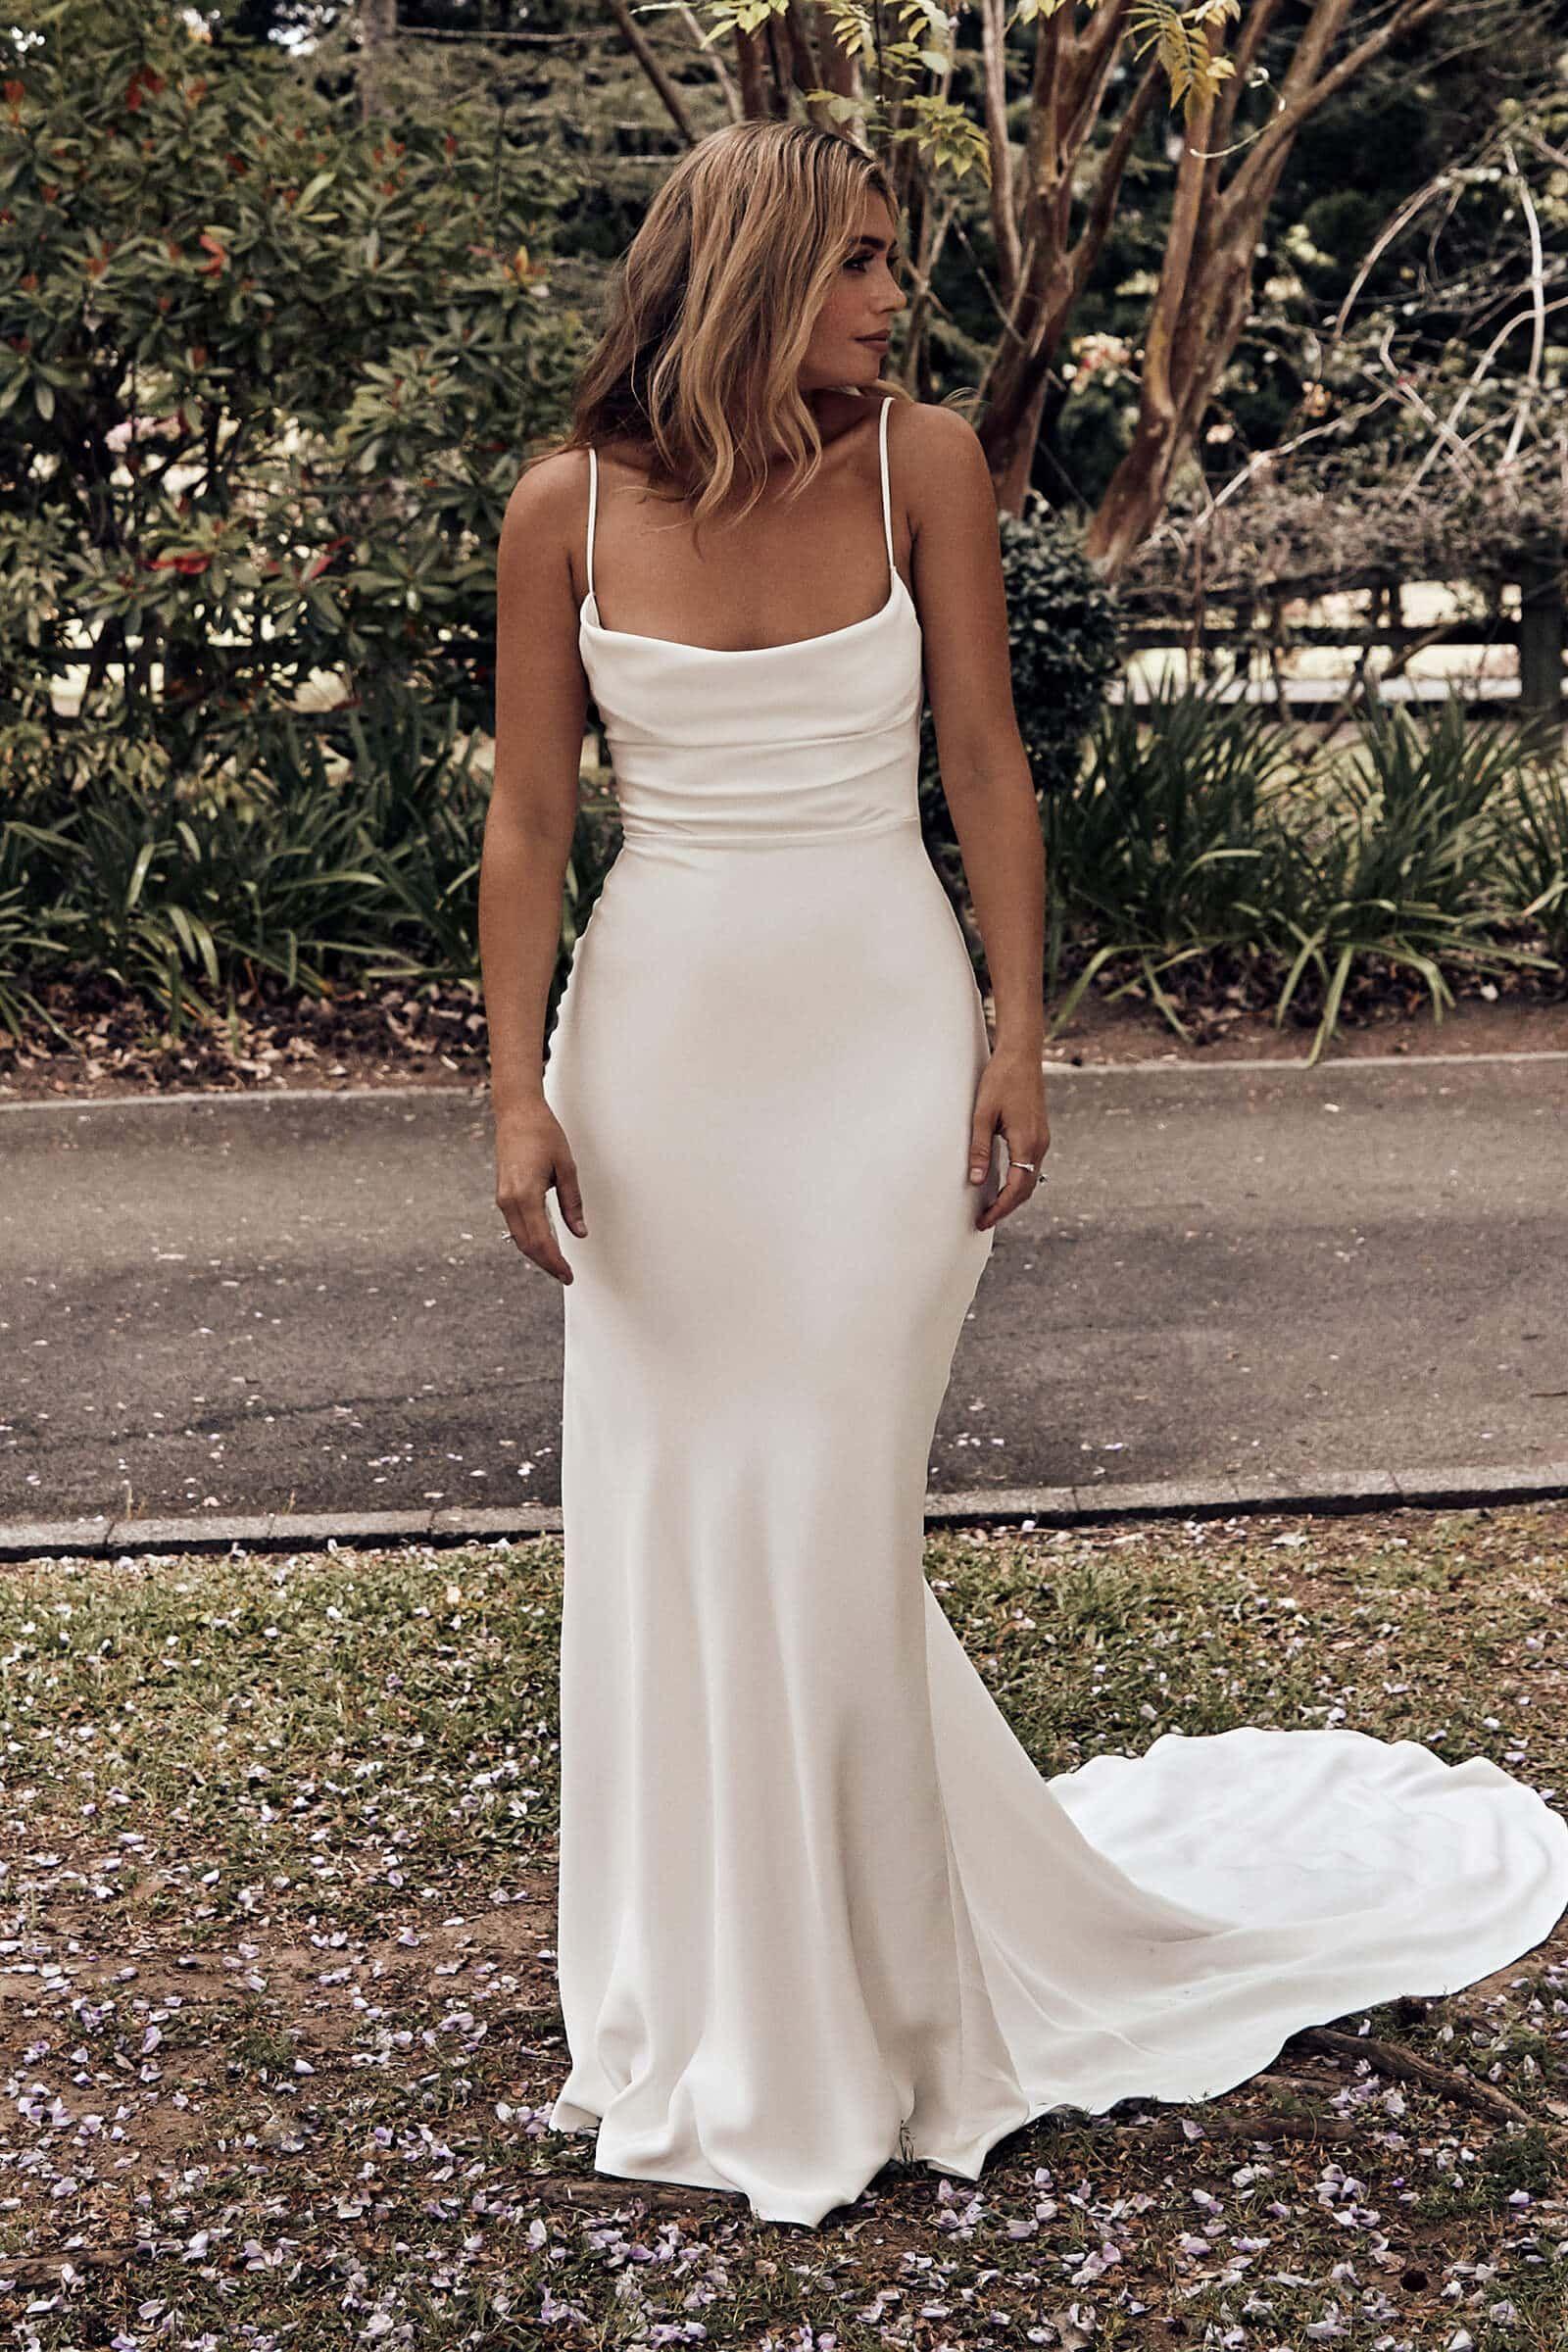 Honey Silk Gown Silk Wedding Dress Grace Loves Lace In 2020 Rustic Wedding Dresses Wedding Dress Guide Wedding Dresses Lace [ 2400 x 1600 Pixel ]